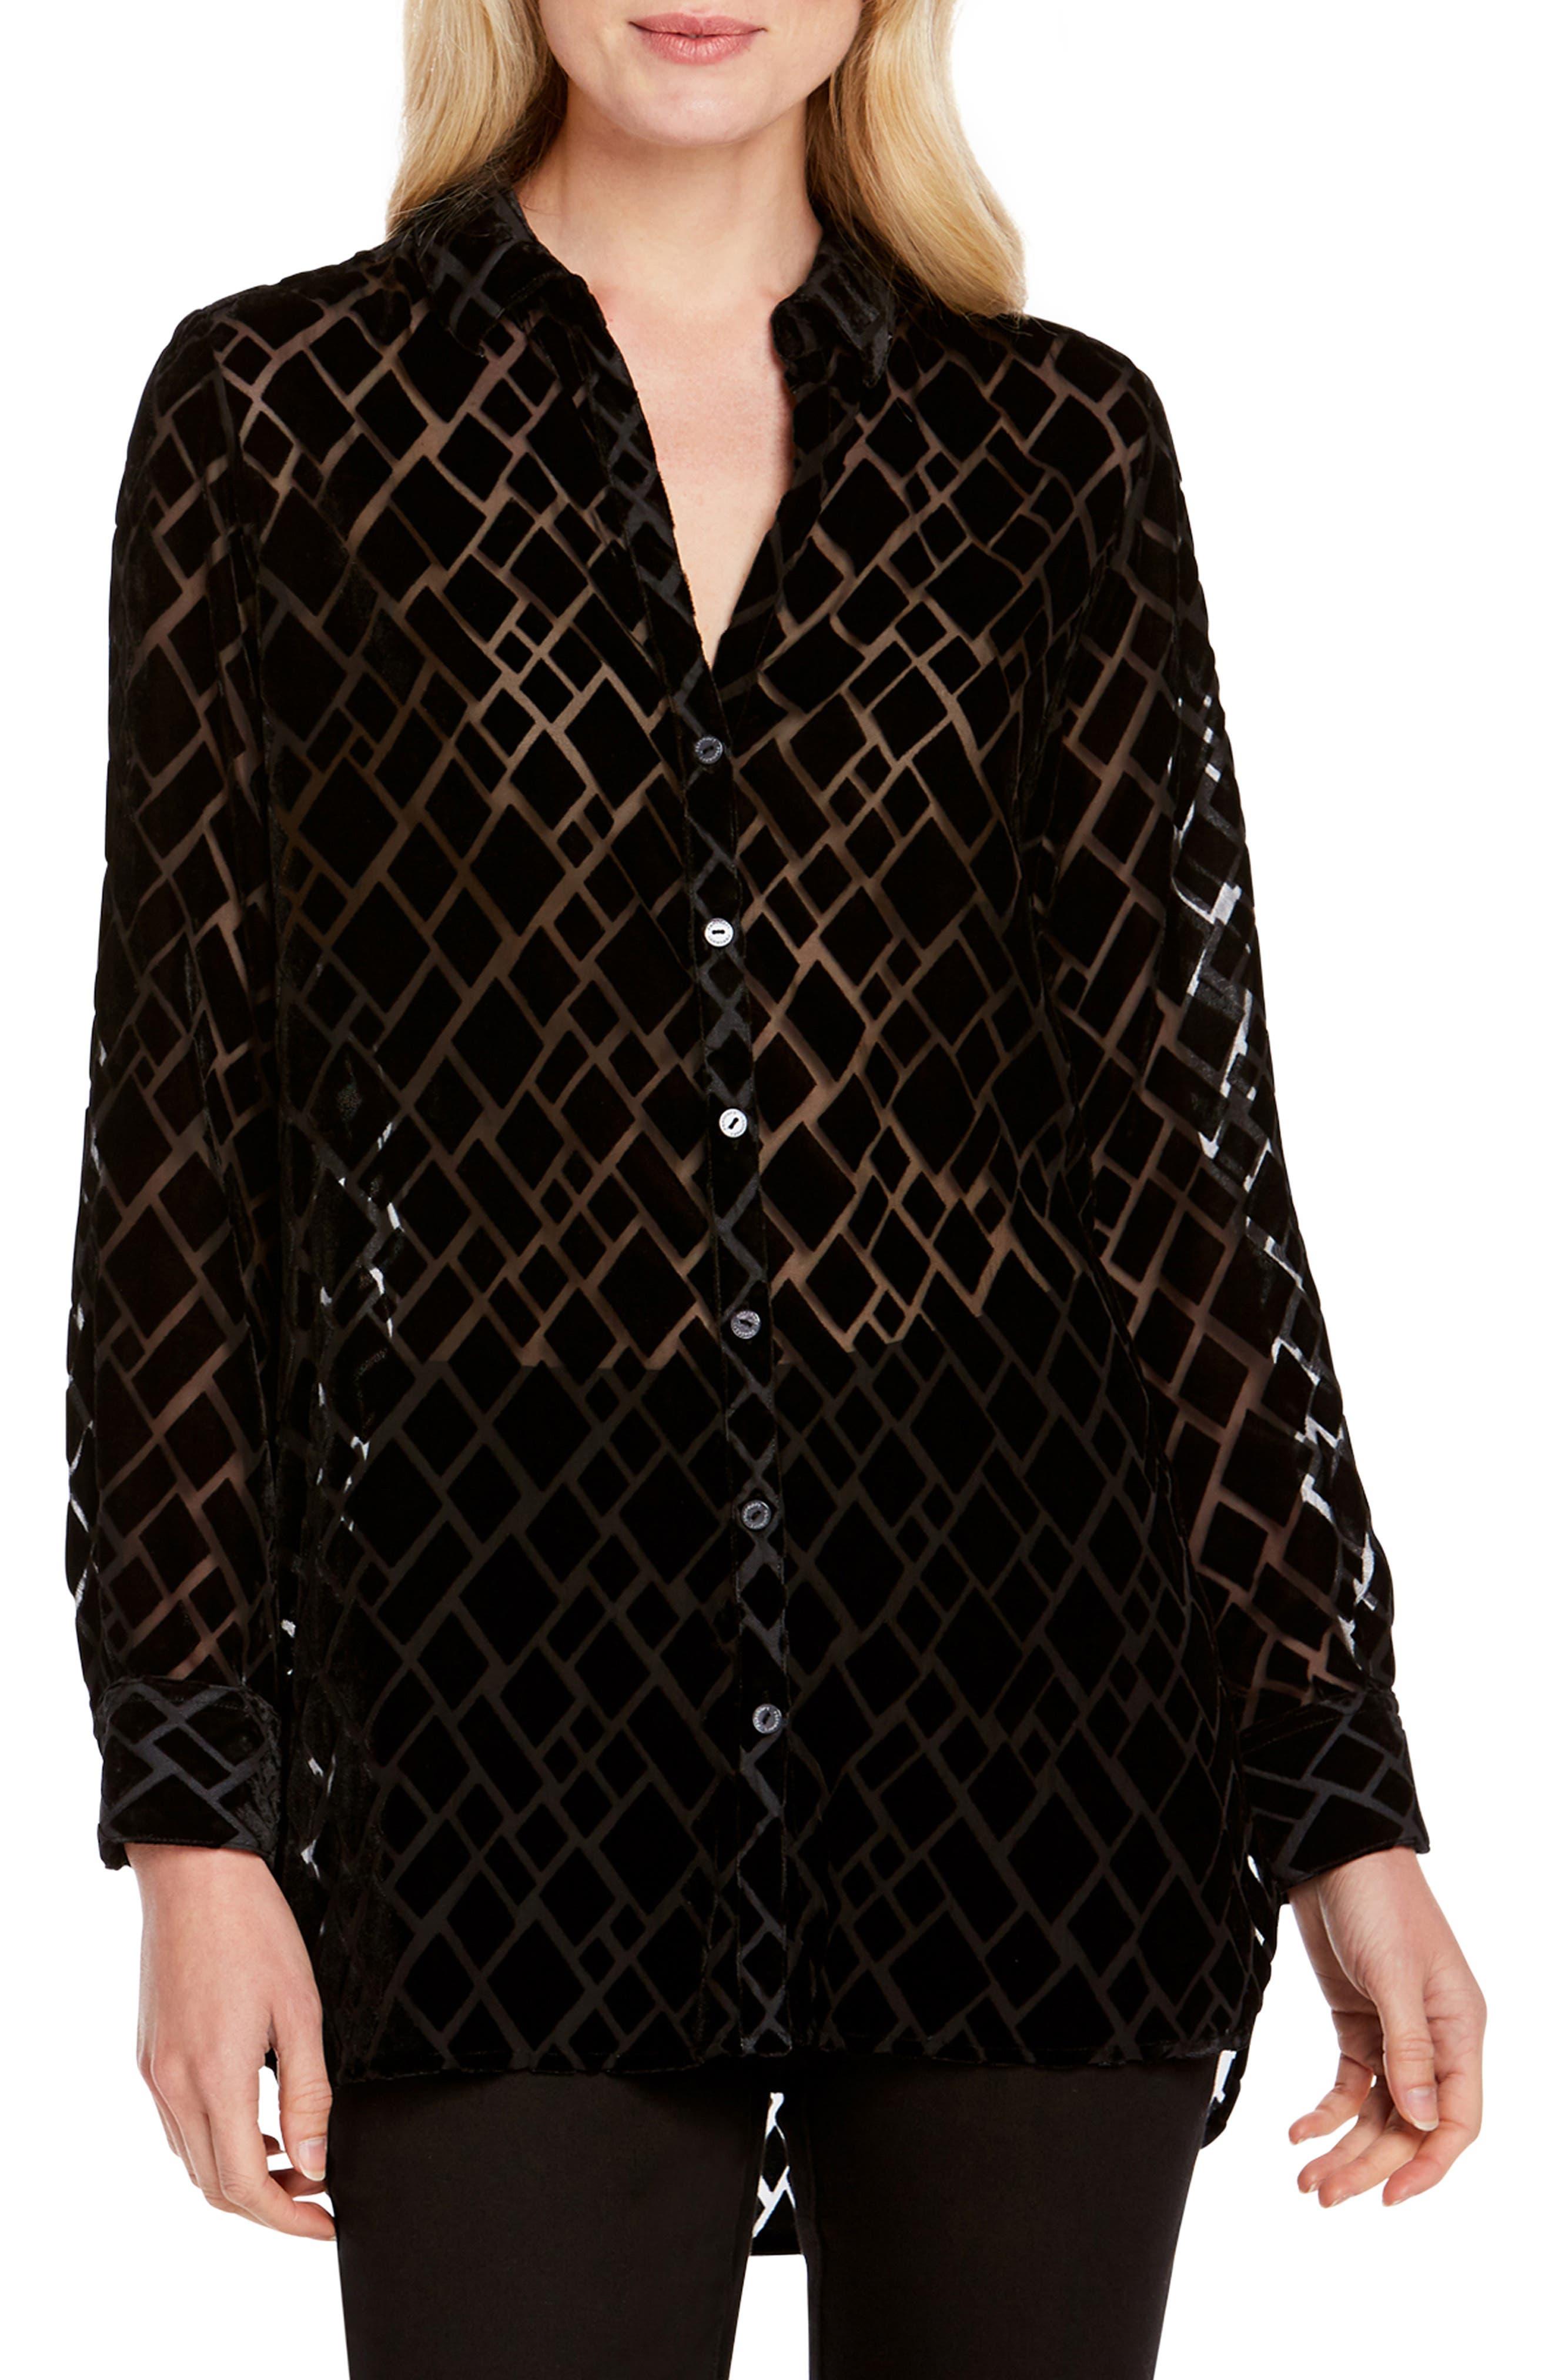 Jade Sheer Diamond Burnout Tunic Top in Black